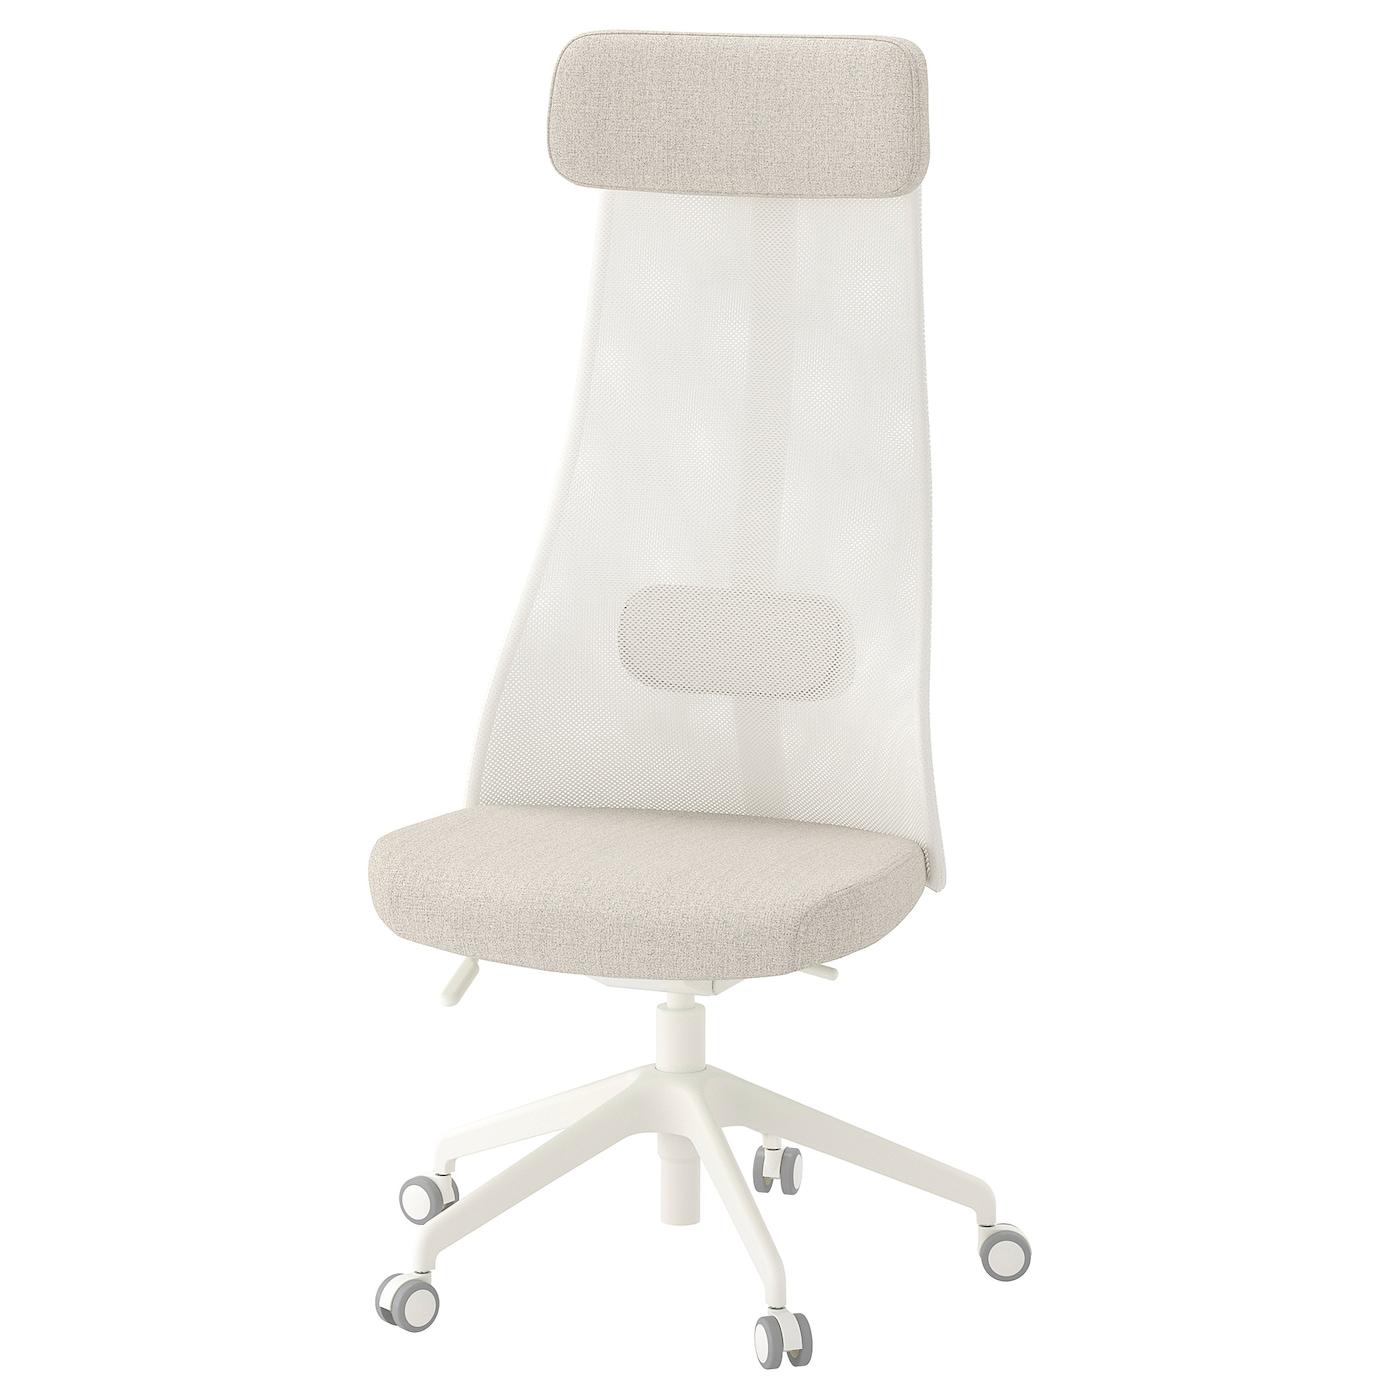 fjaellet-office-chair-gunnared-beige__0664136_PE712677_S5